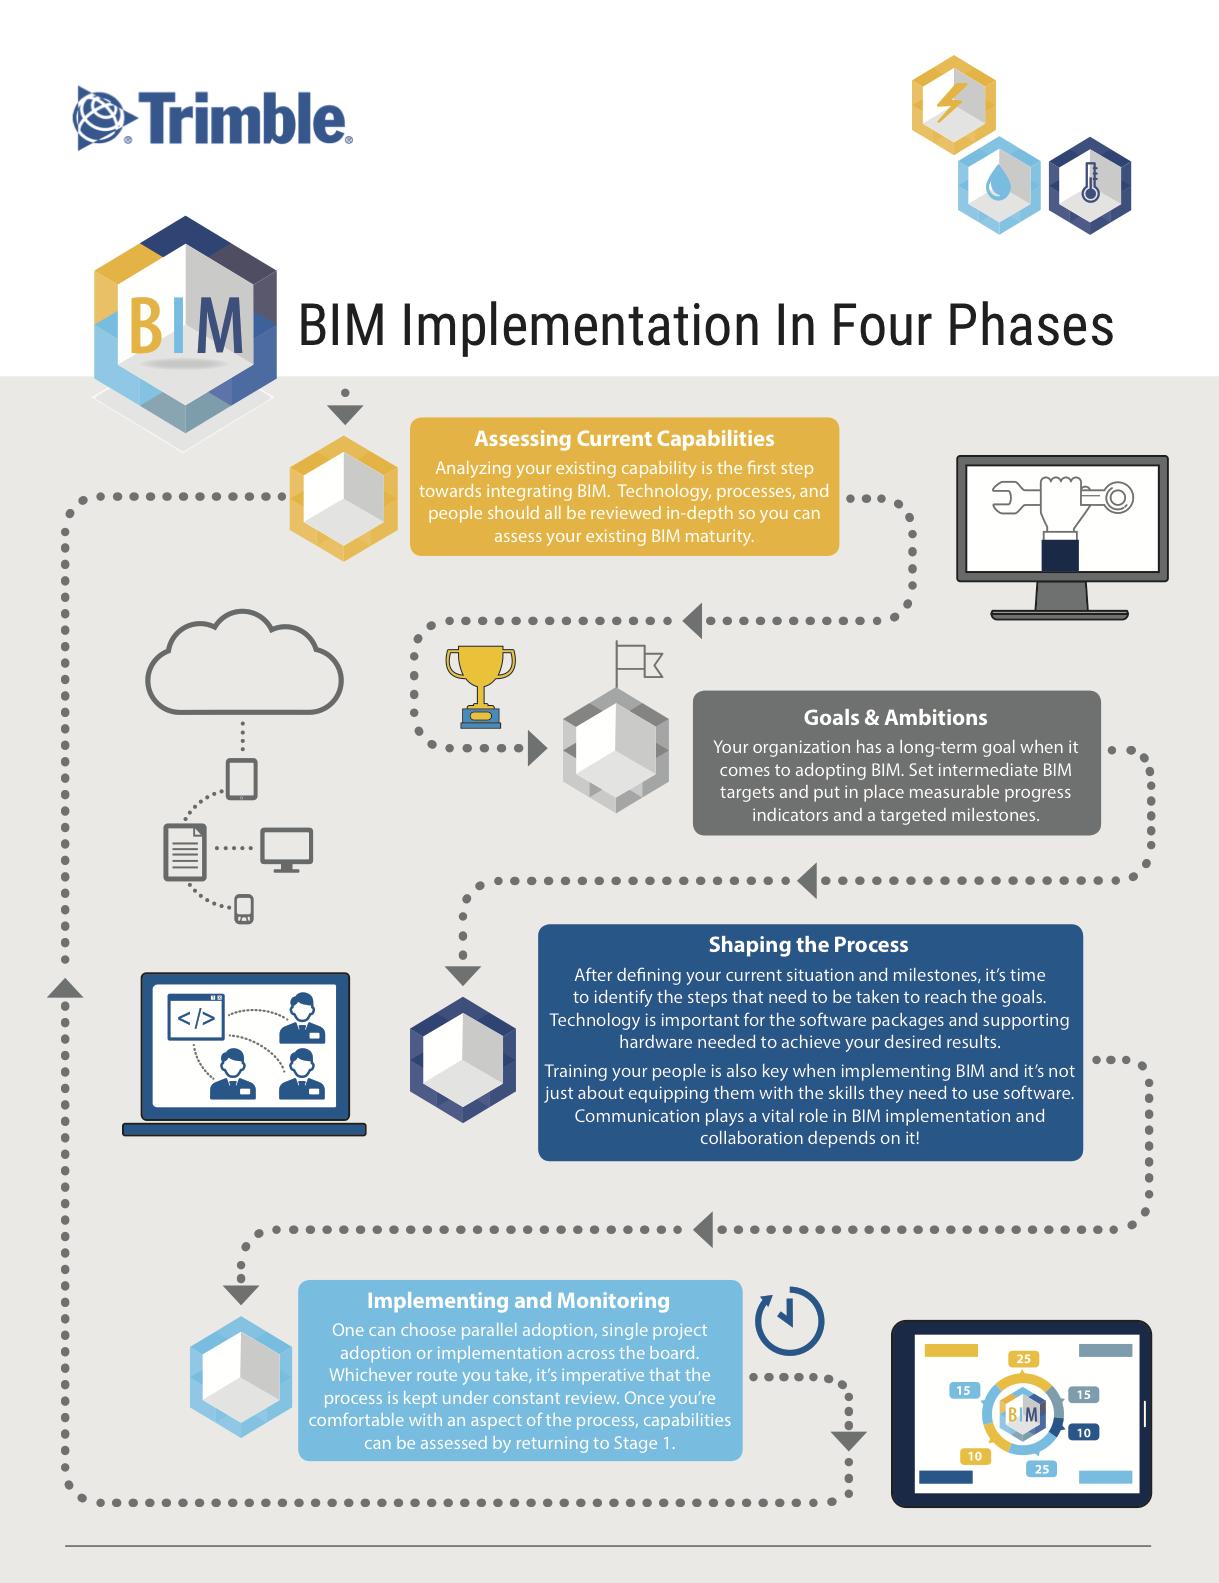 4 Steps To Successful Bim Implementation Infographic Building Information Modeling Bim Management Infographic